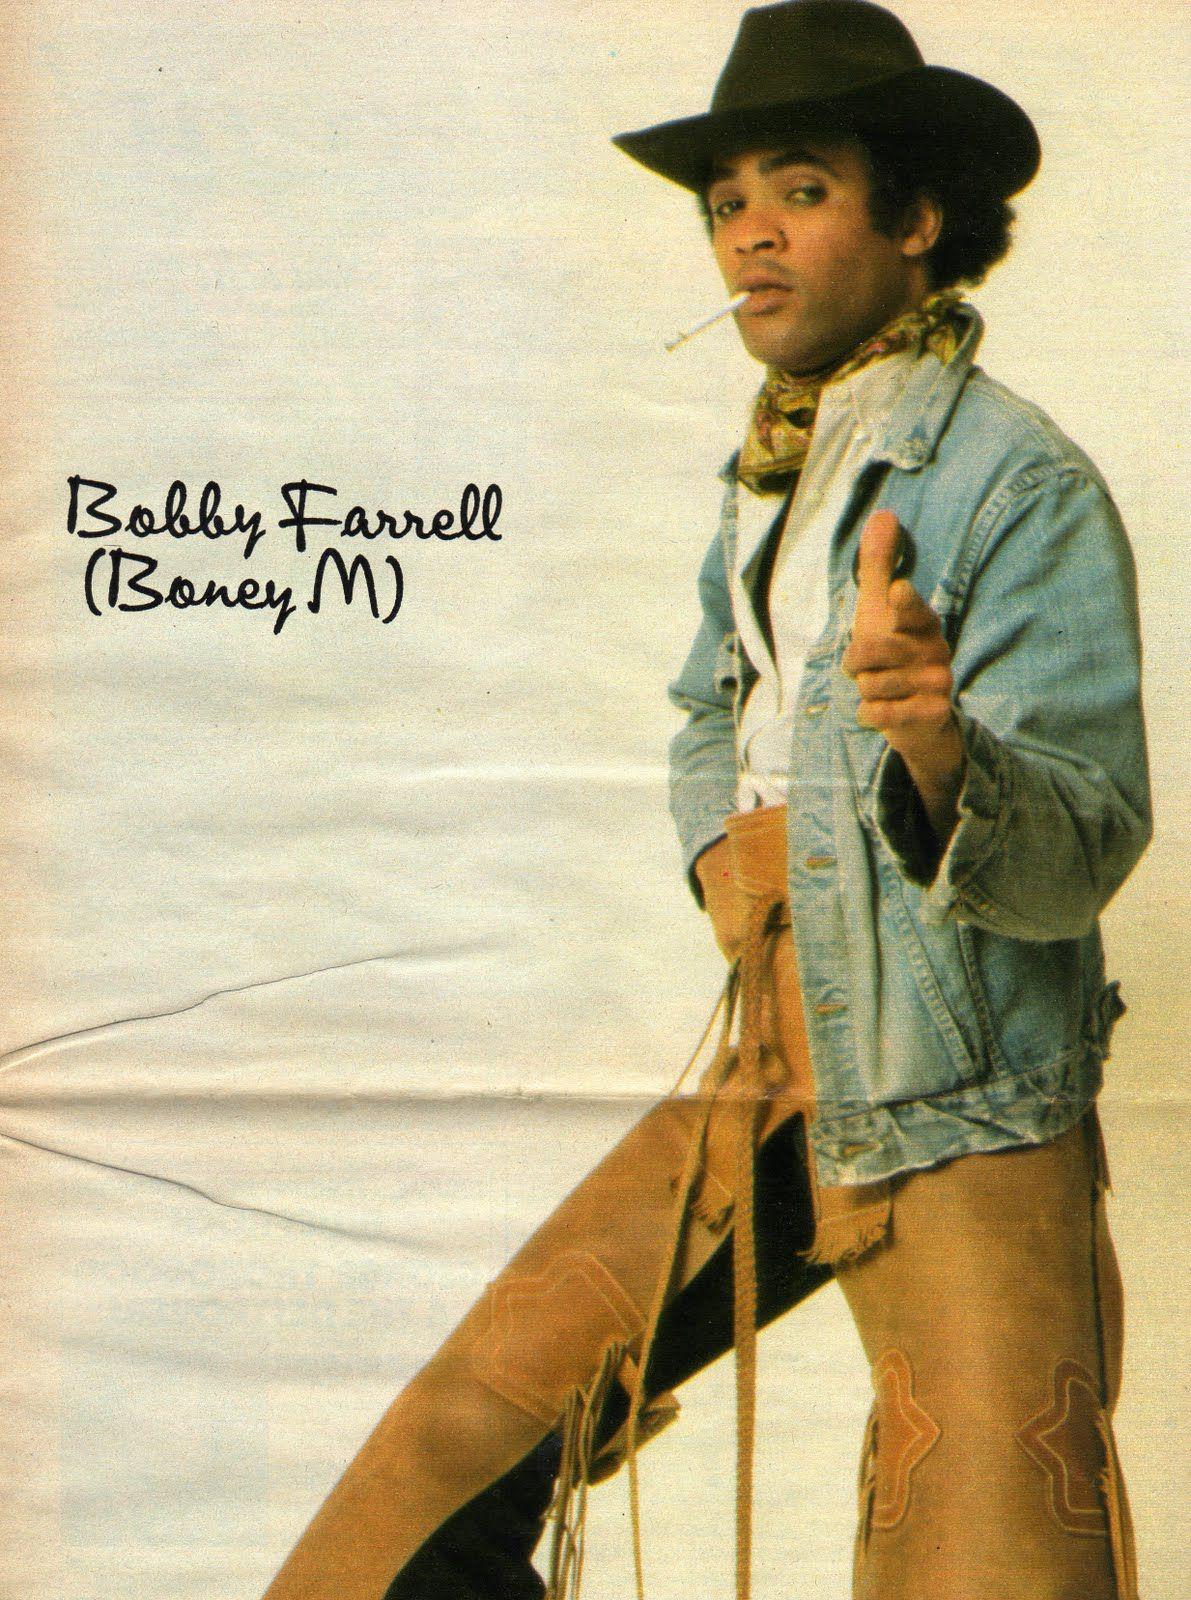 Bobby Farrell Boney M Disco Frank Farian